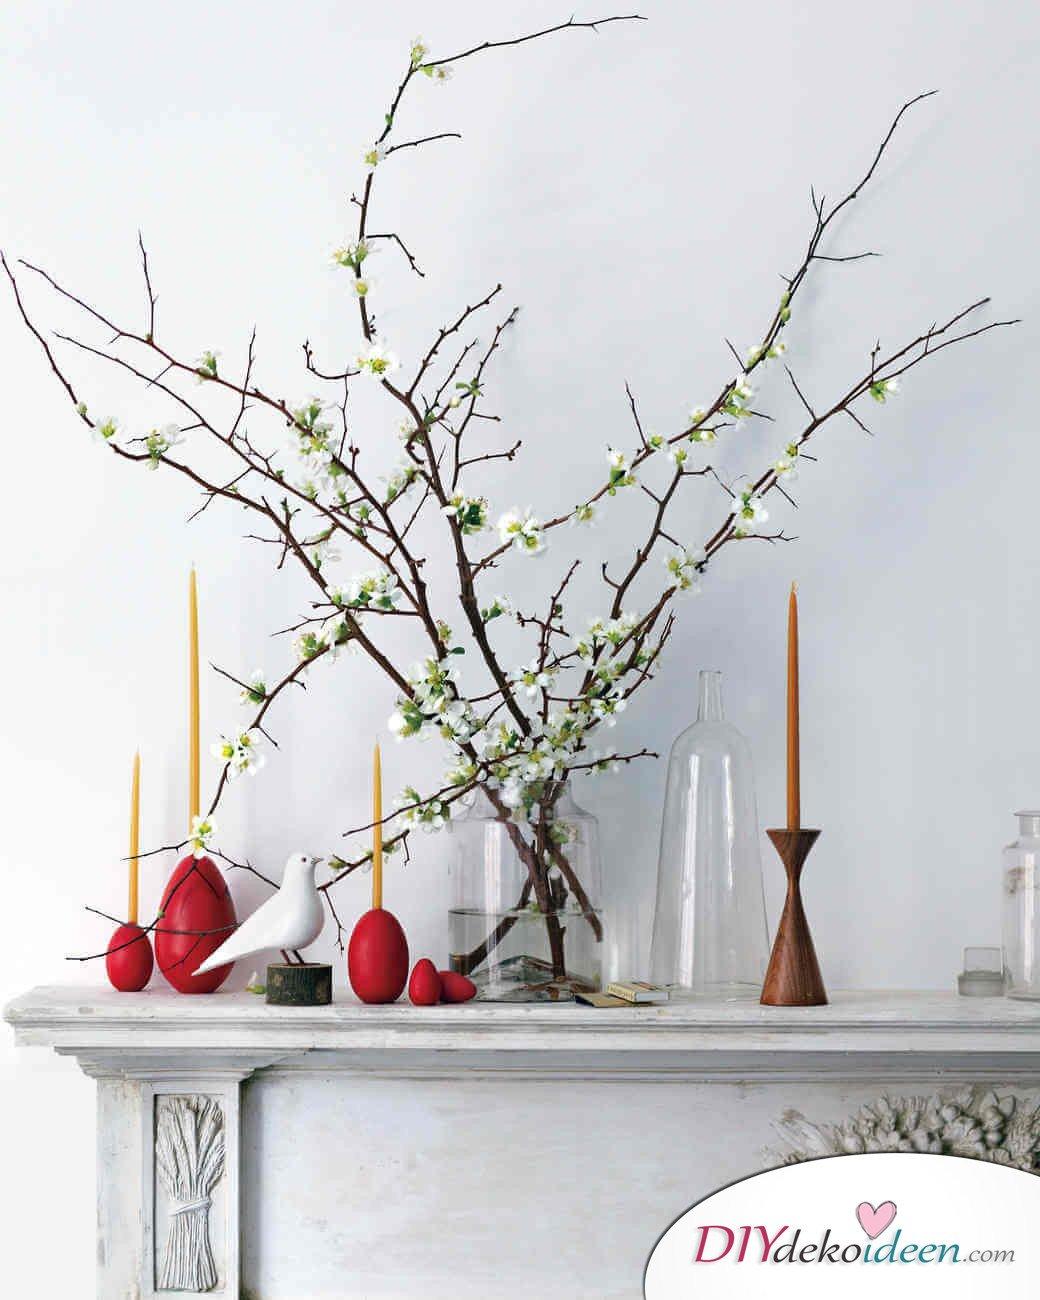 DIY Ideen - Osterdeko basteln - Osterei-Kerzenständer